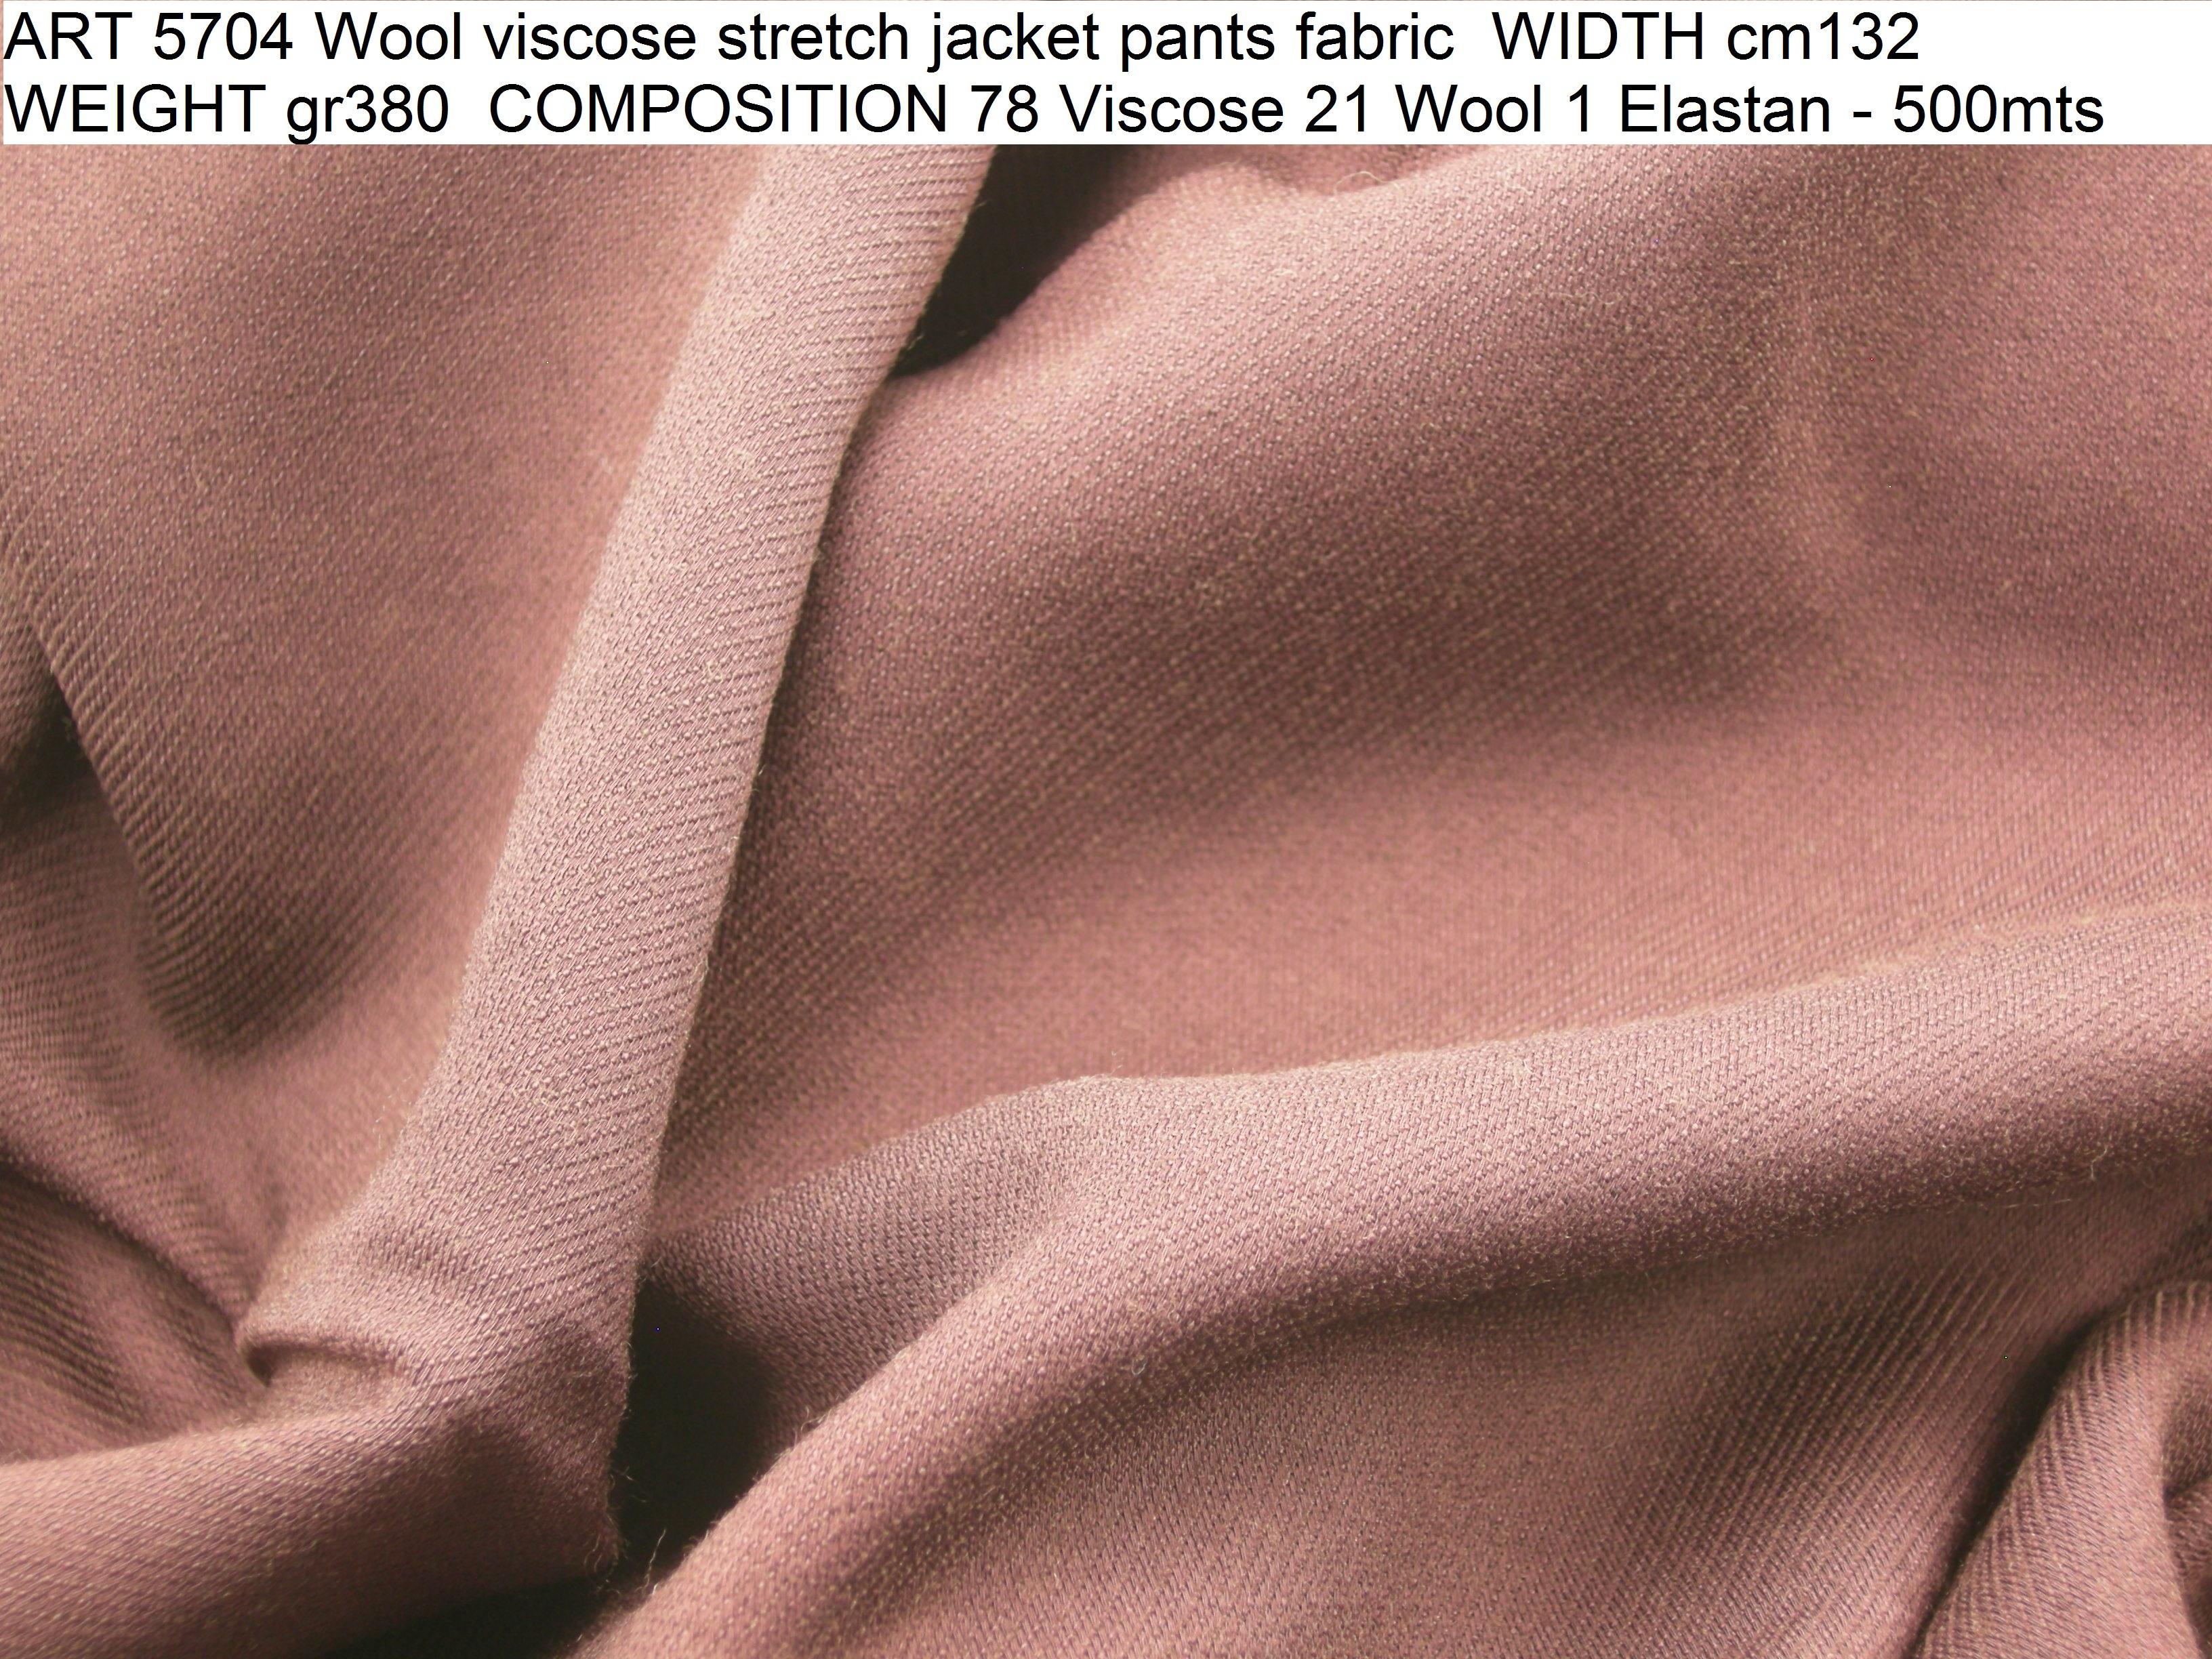 ART 5704 Wool viscose stretch jacket pants fabric WIDTH cm132 WEIGHT gr380 COMPOSITION 78 Viscose 21 Wool 1 Elastan - 500mts